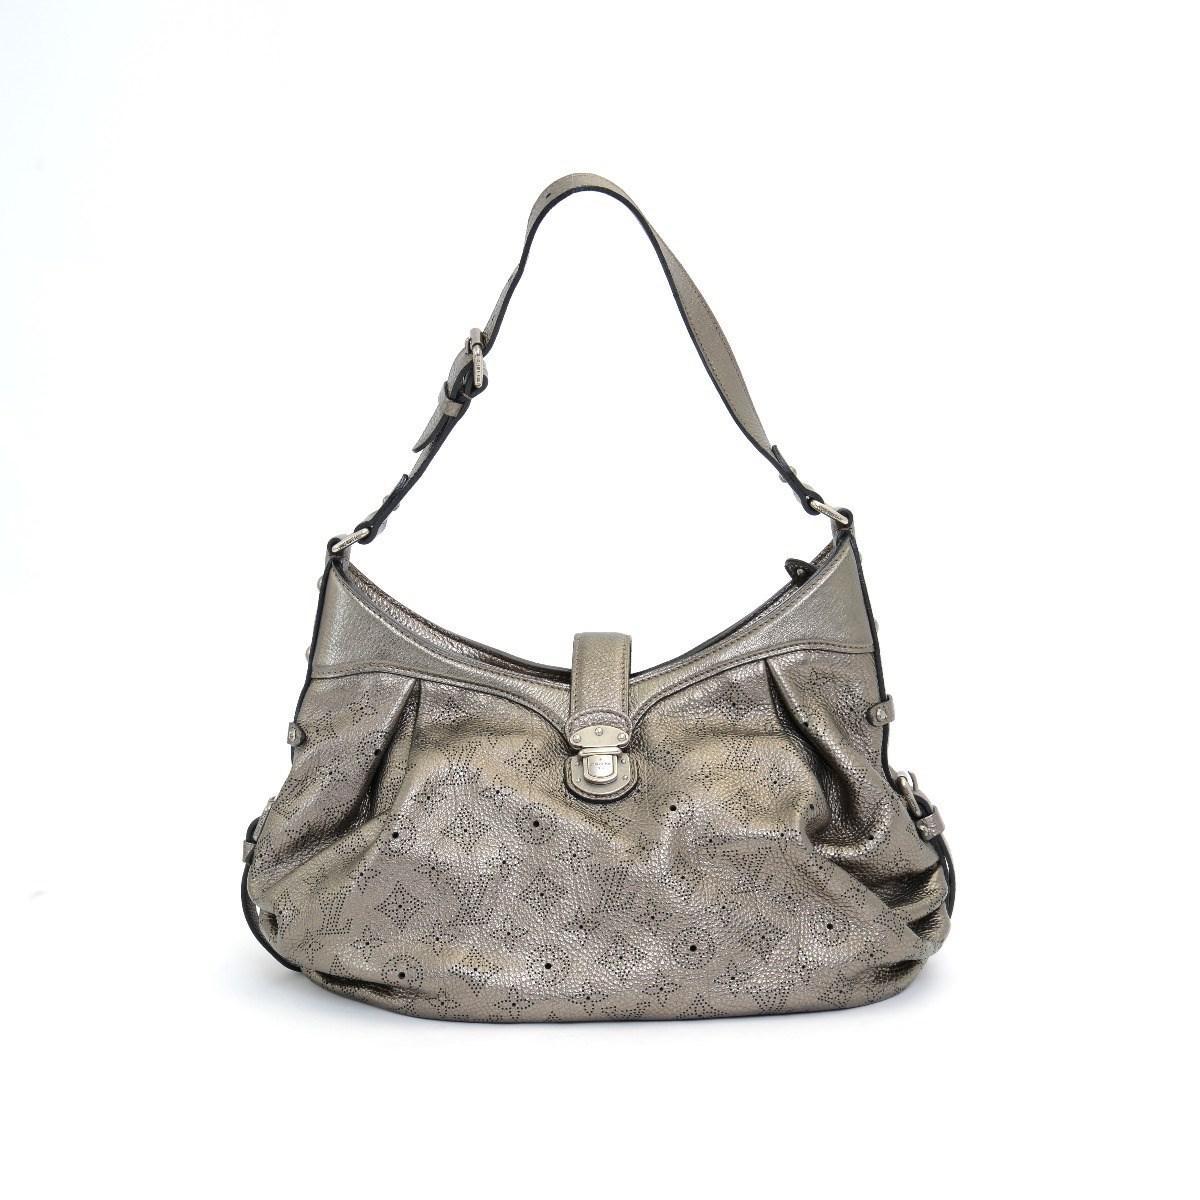 3c911e541f83 Lyst - Louis Vuitton Calf Mahina Xs Bronze Handbag M95717 in Metallic